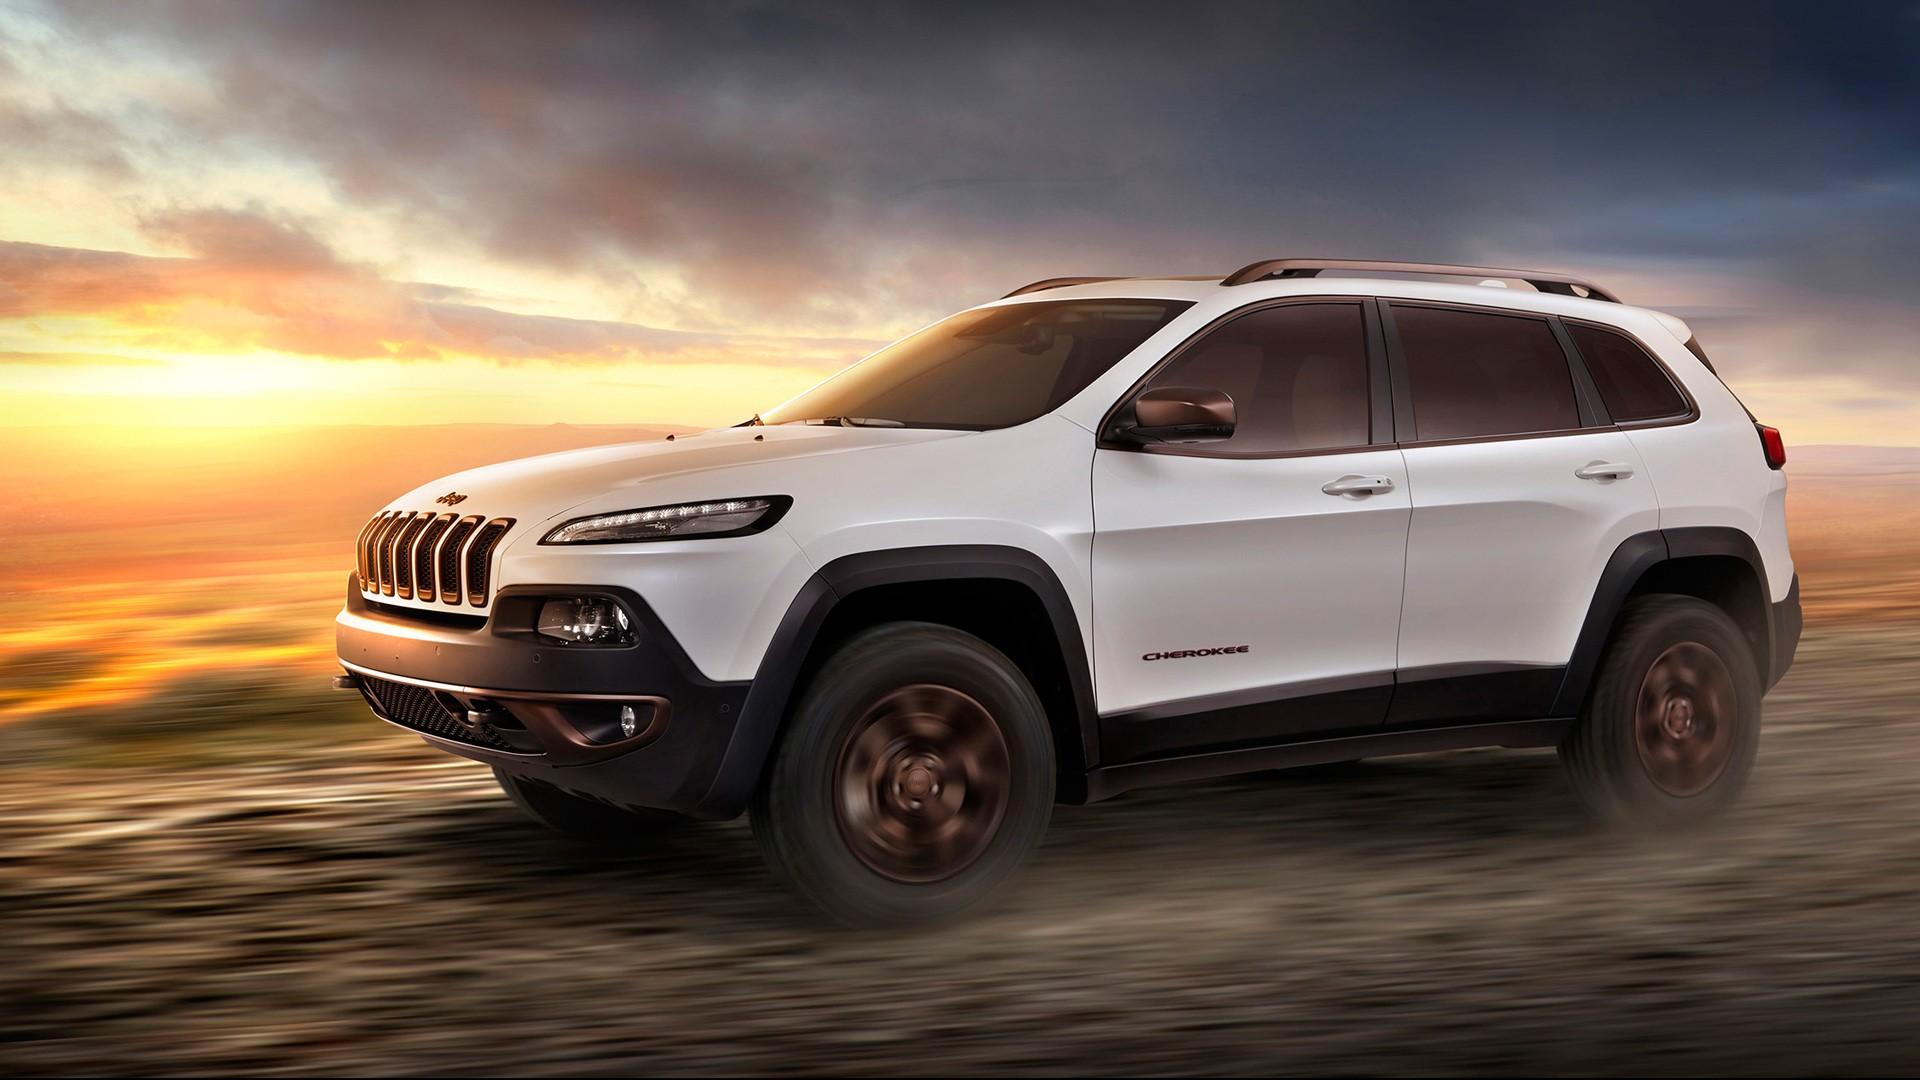 2014 Jeep Cherokee Sageland Concept 3 Wallpaper | HD Car ...